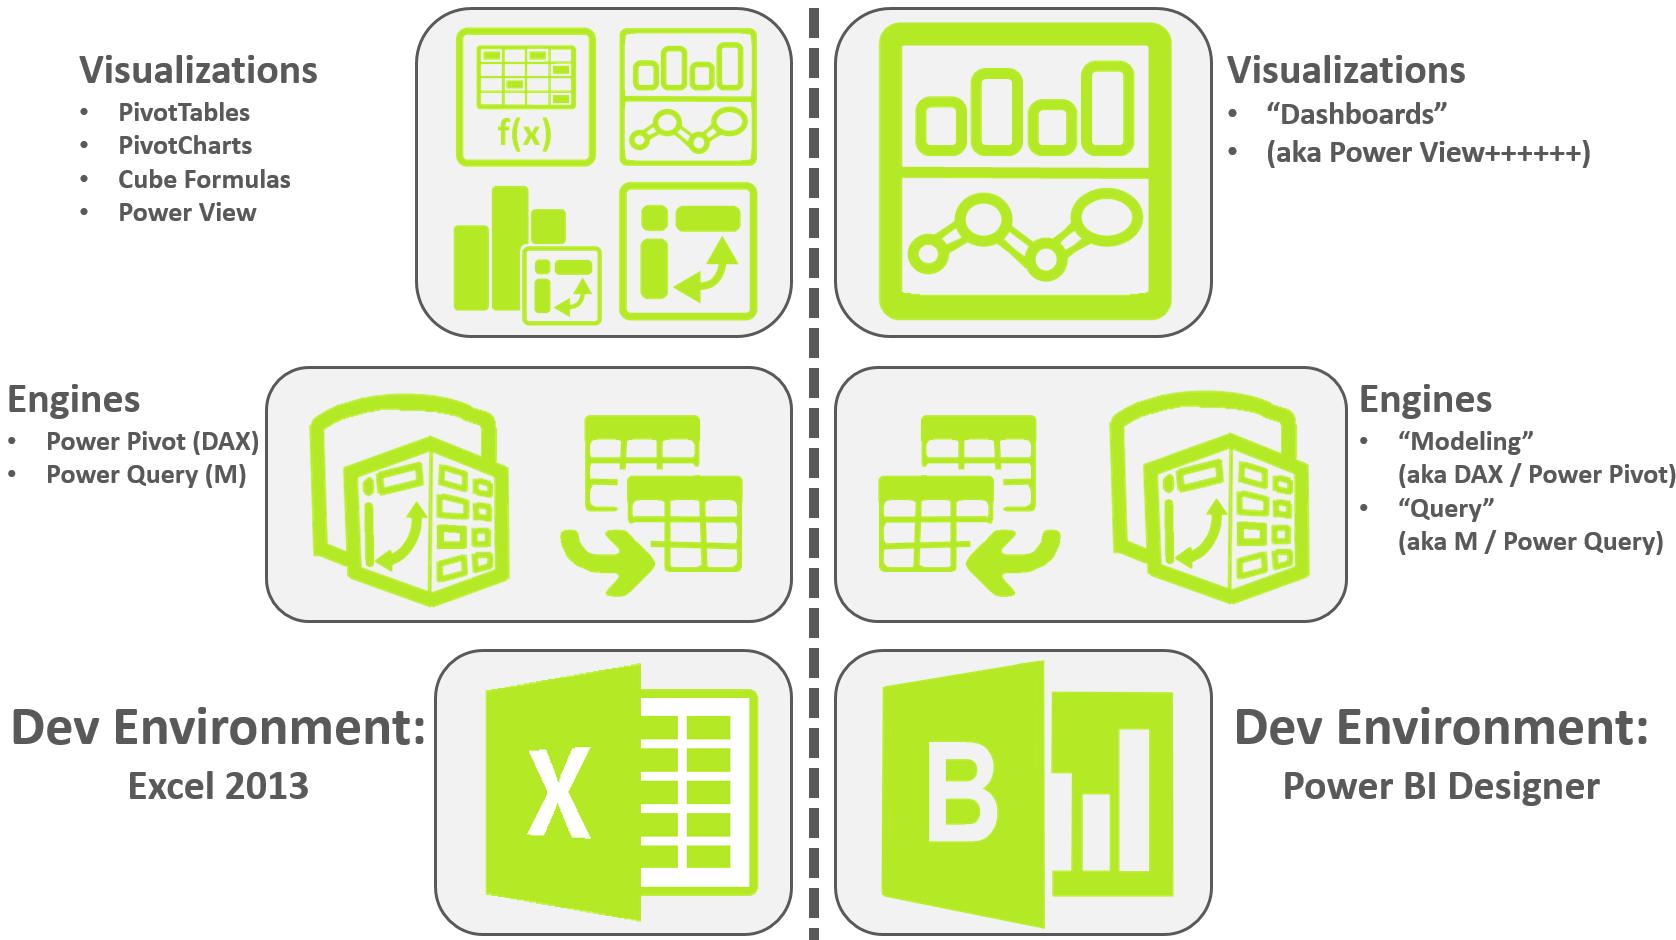 Power Bi Designer Vs Excel What S Microsoft Up To